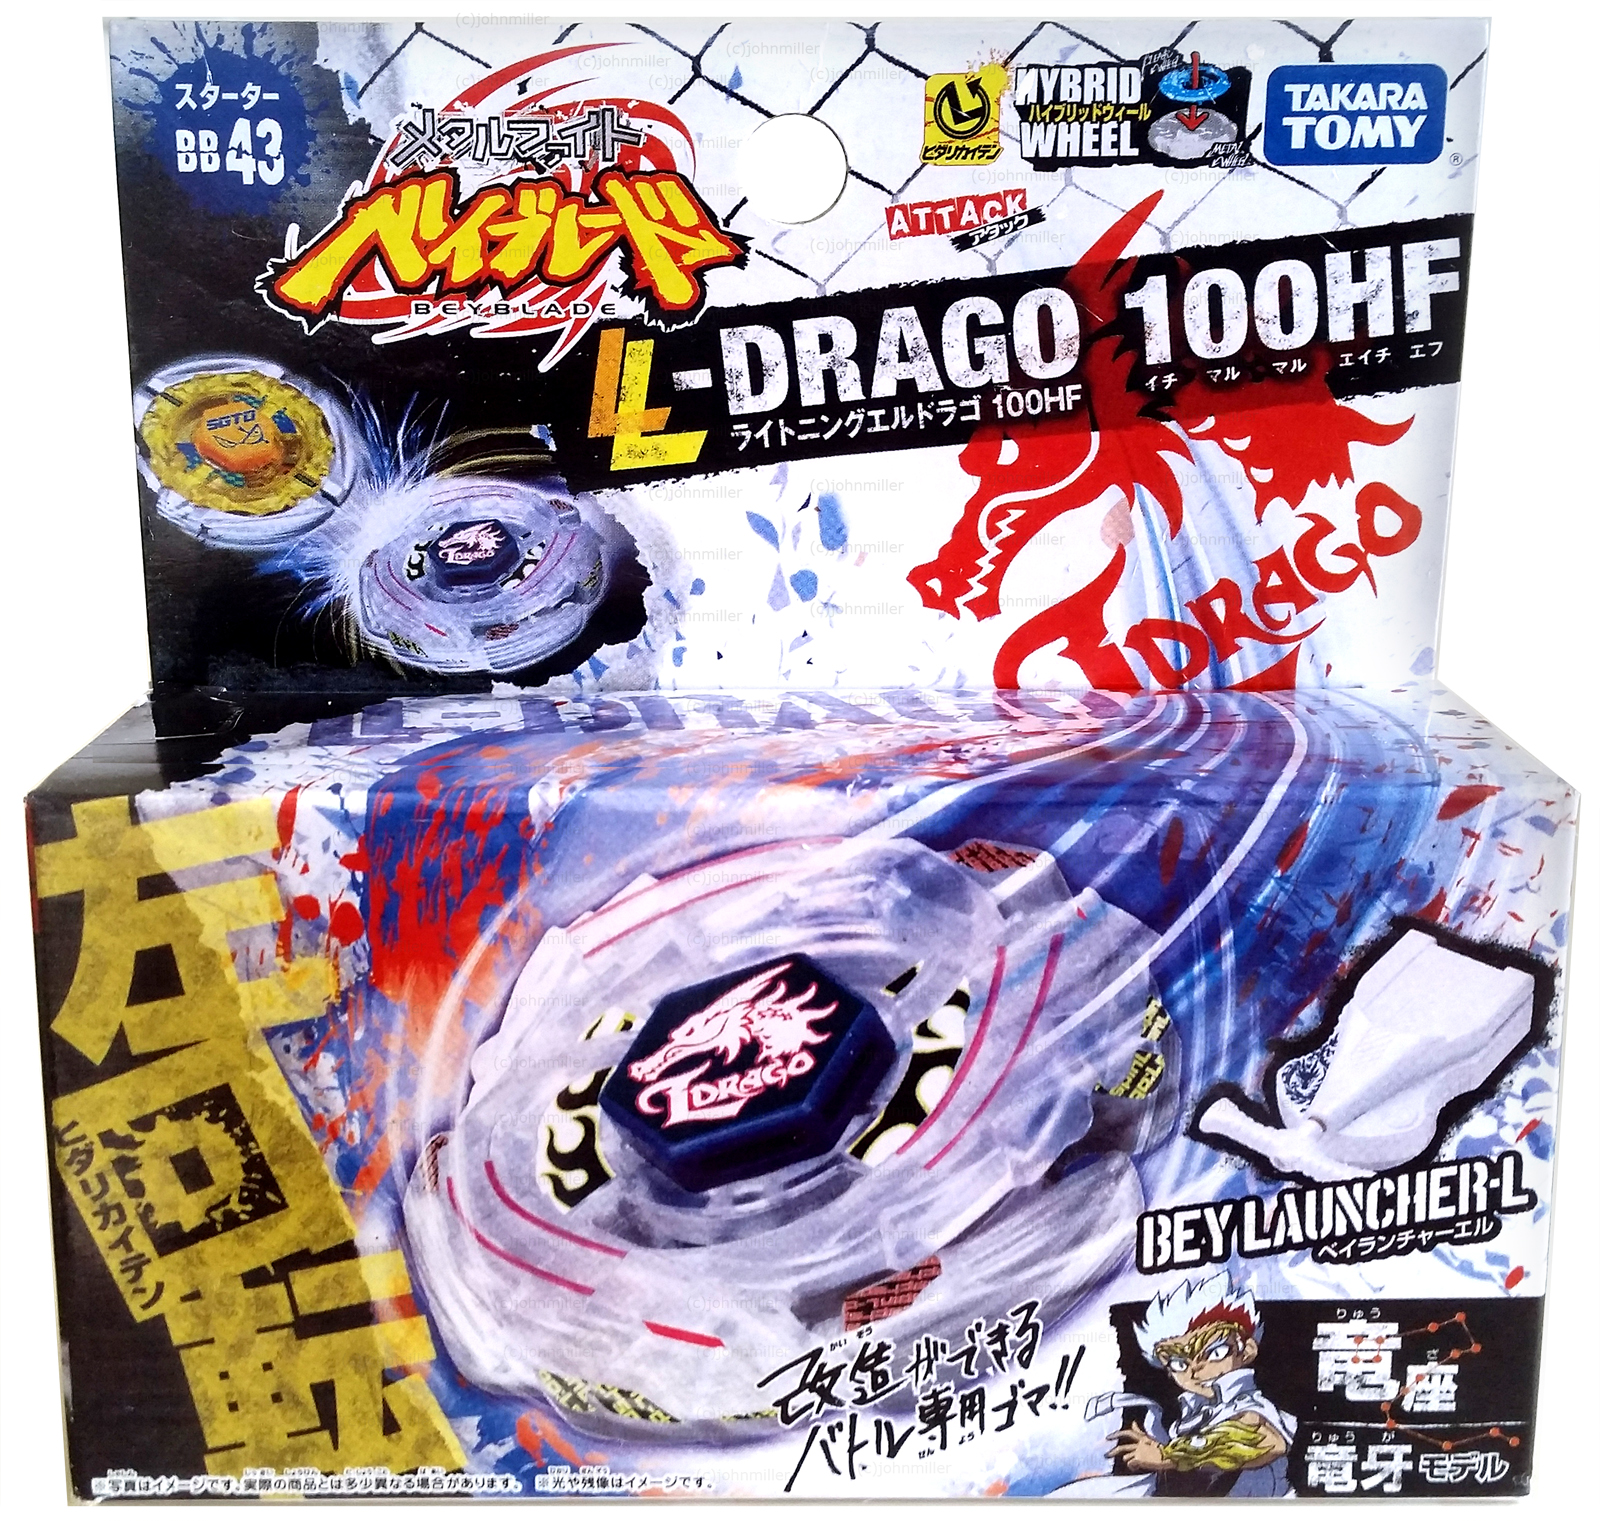 Beyblade Lightning L Drago